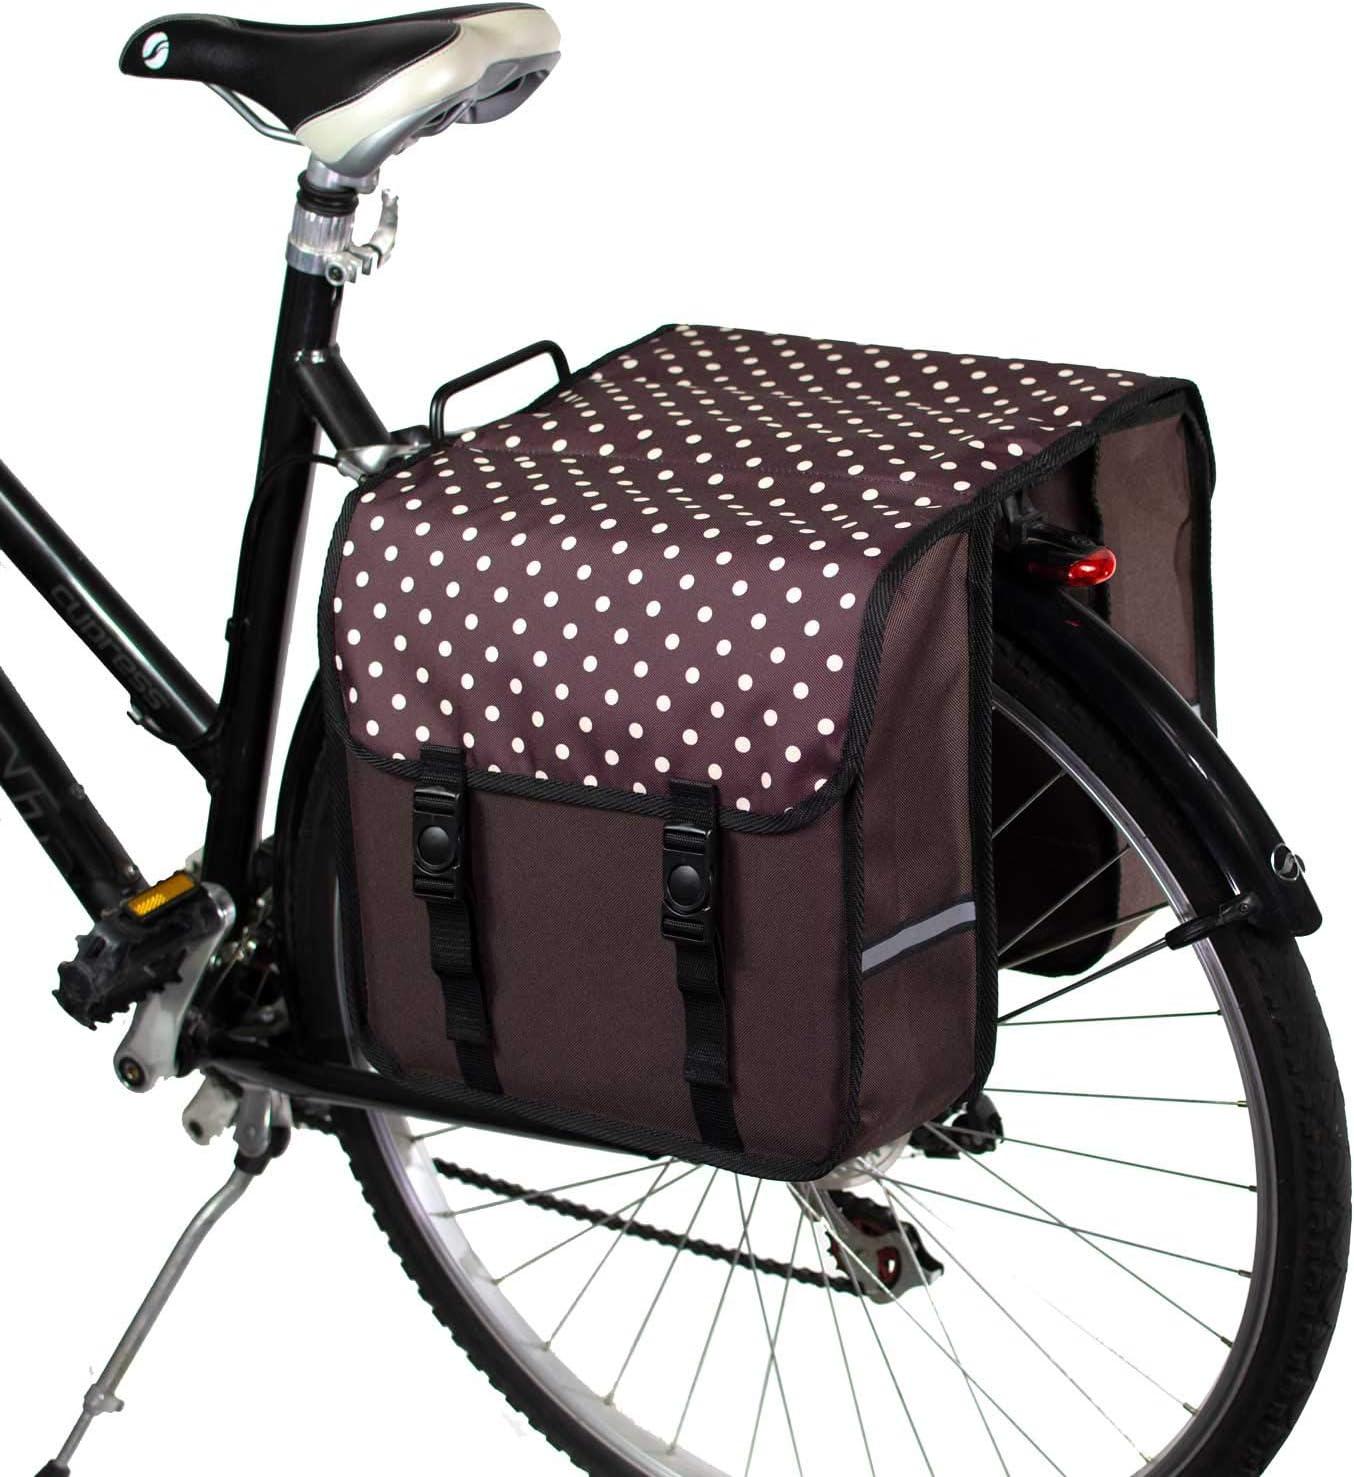 BikyBag Clásica Doble alforjas Bolsa para Bicicleta Mujer - Hombre ...